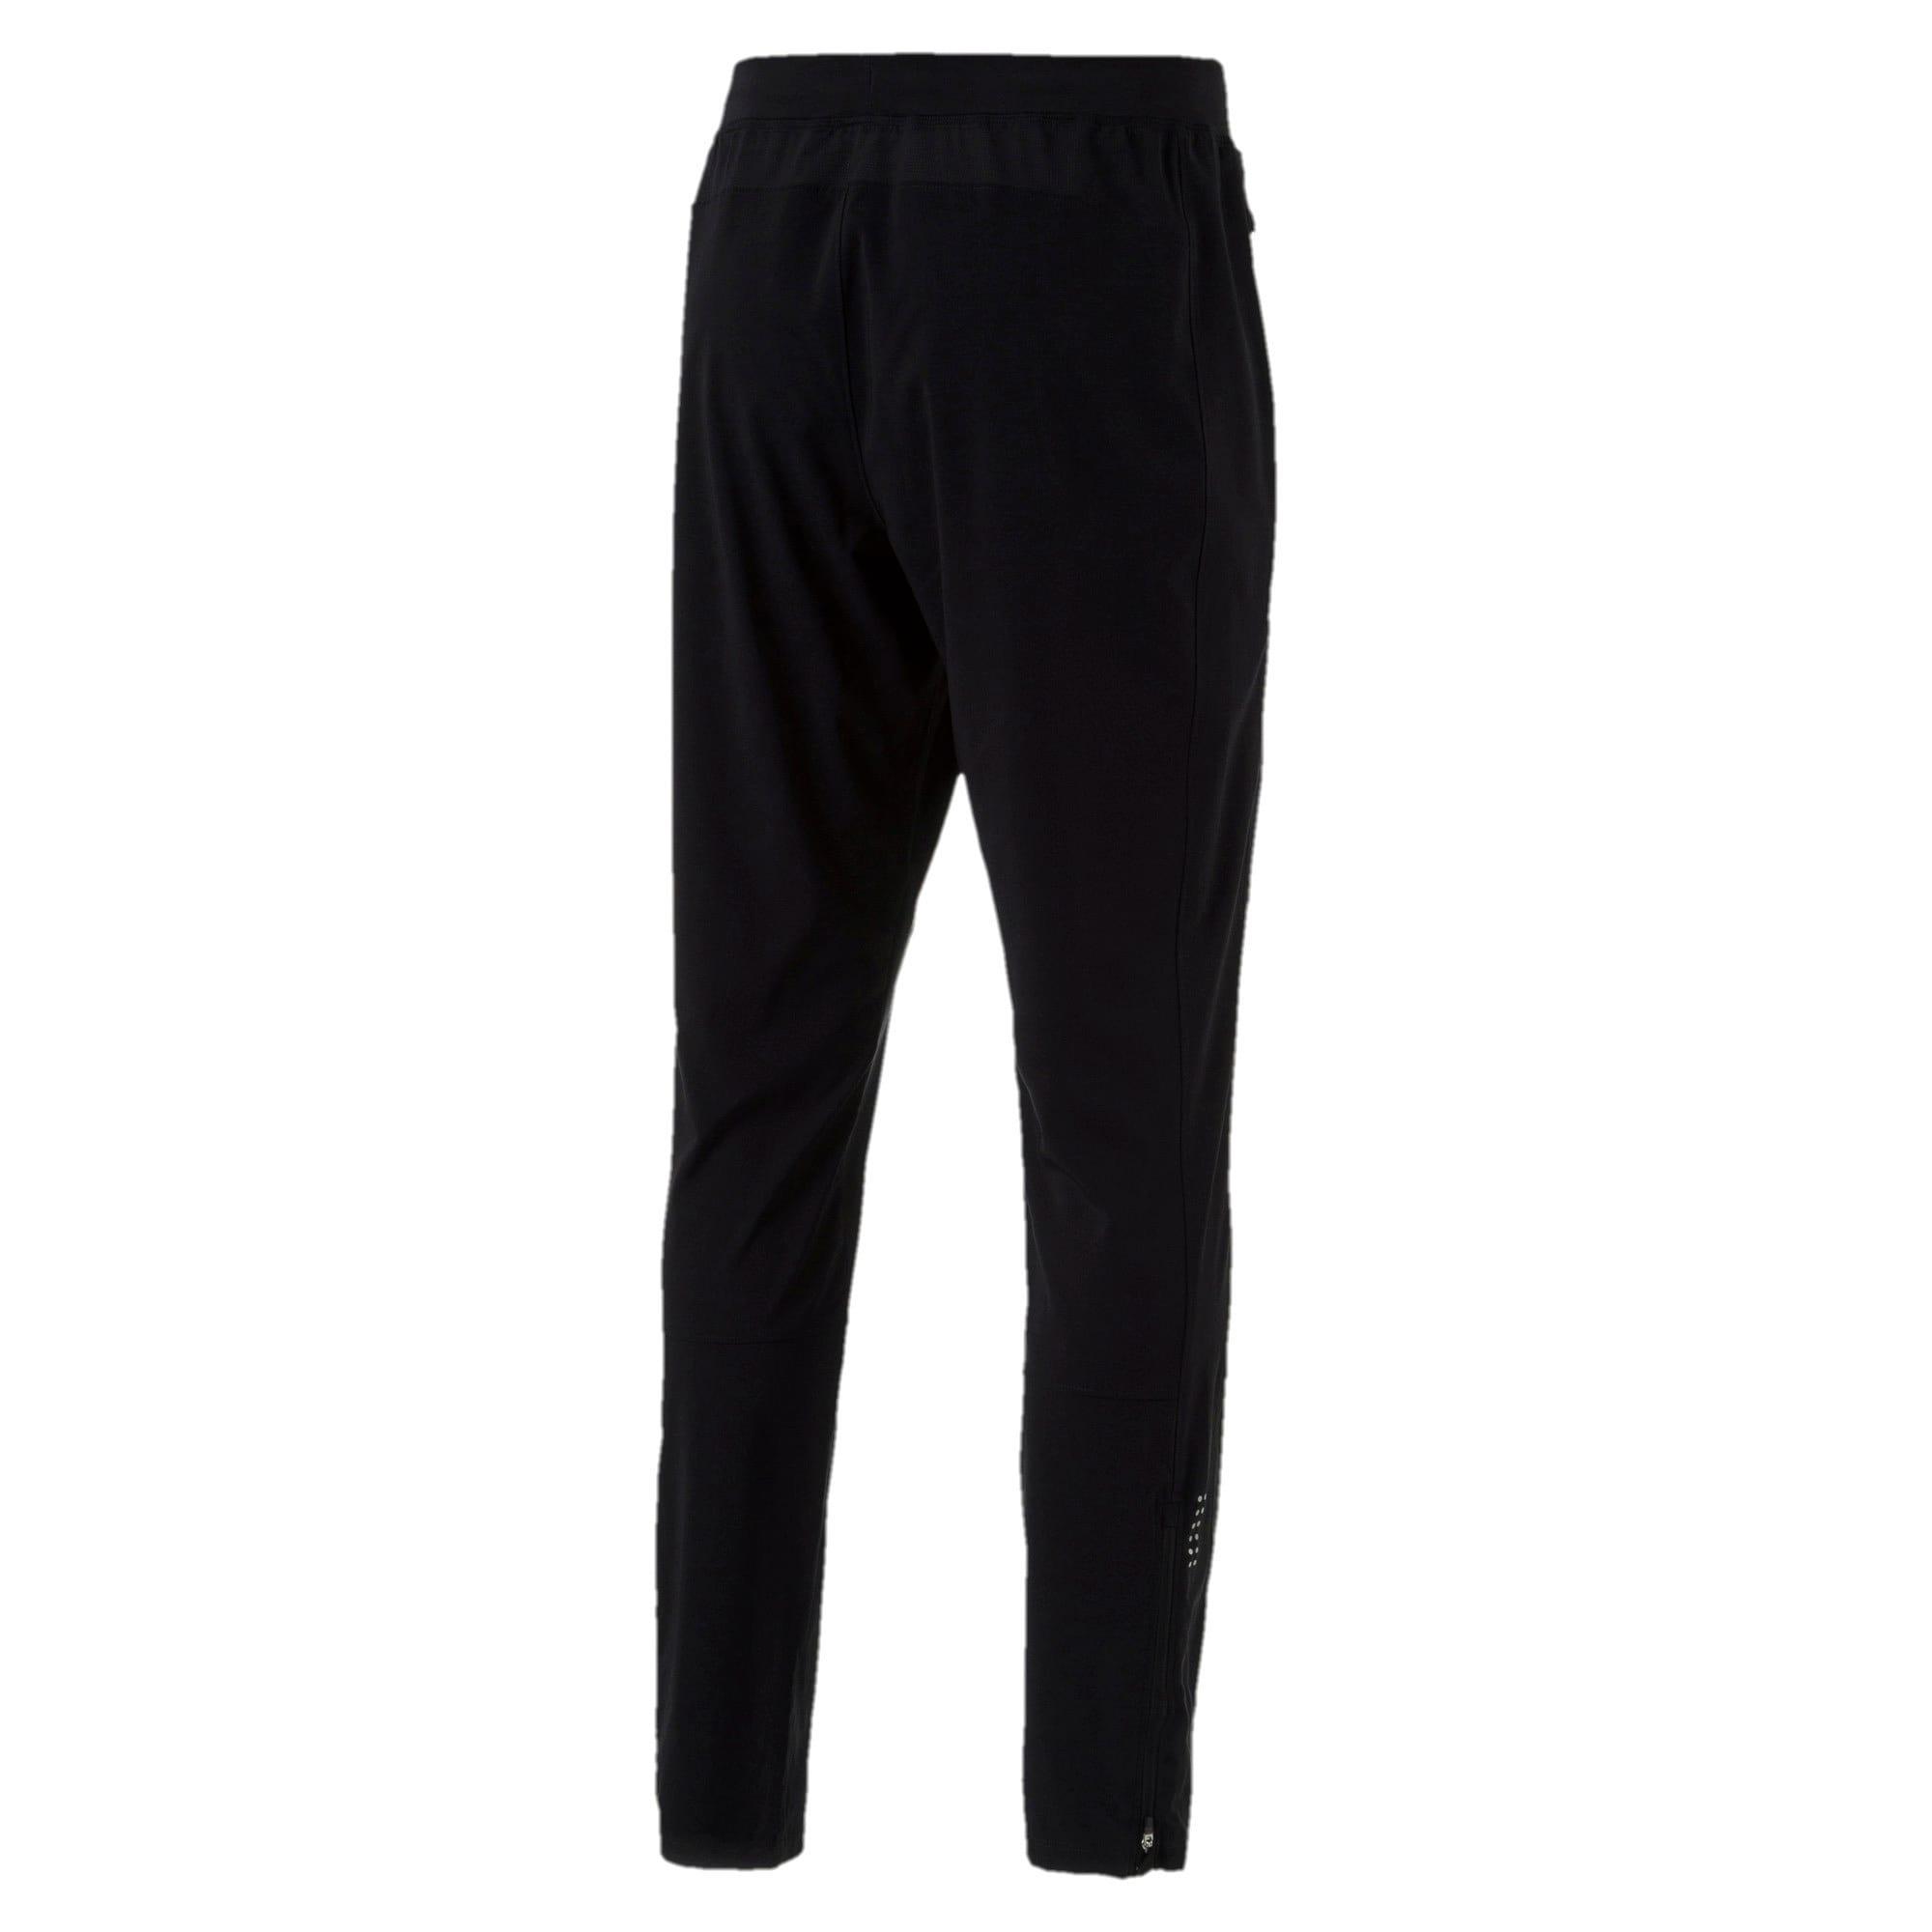 Thumbnail 5 of Tapered Woven Men's Running Pants, Puma Black, medium-IND